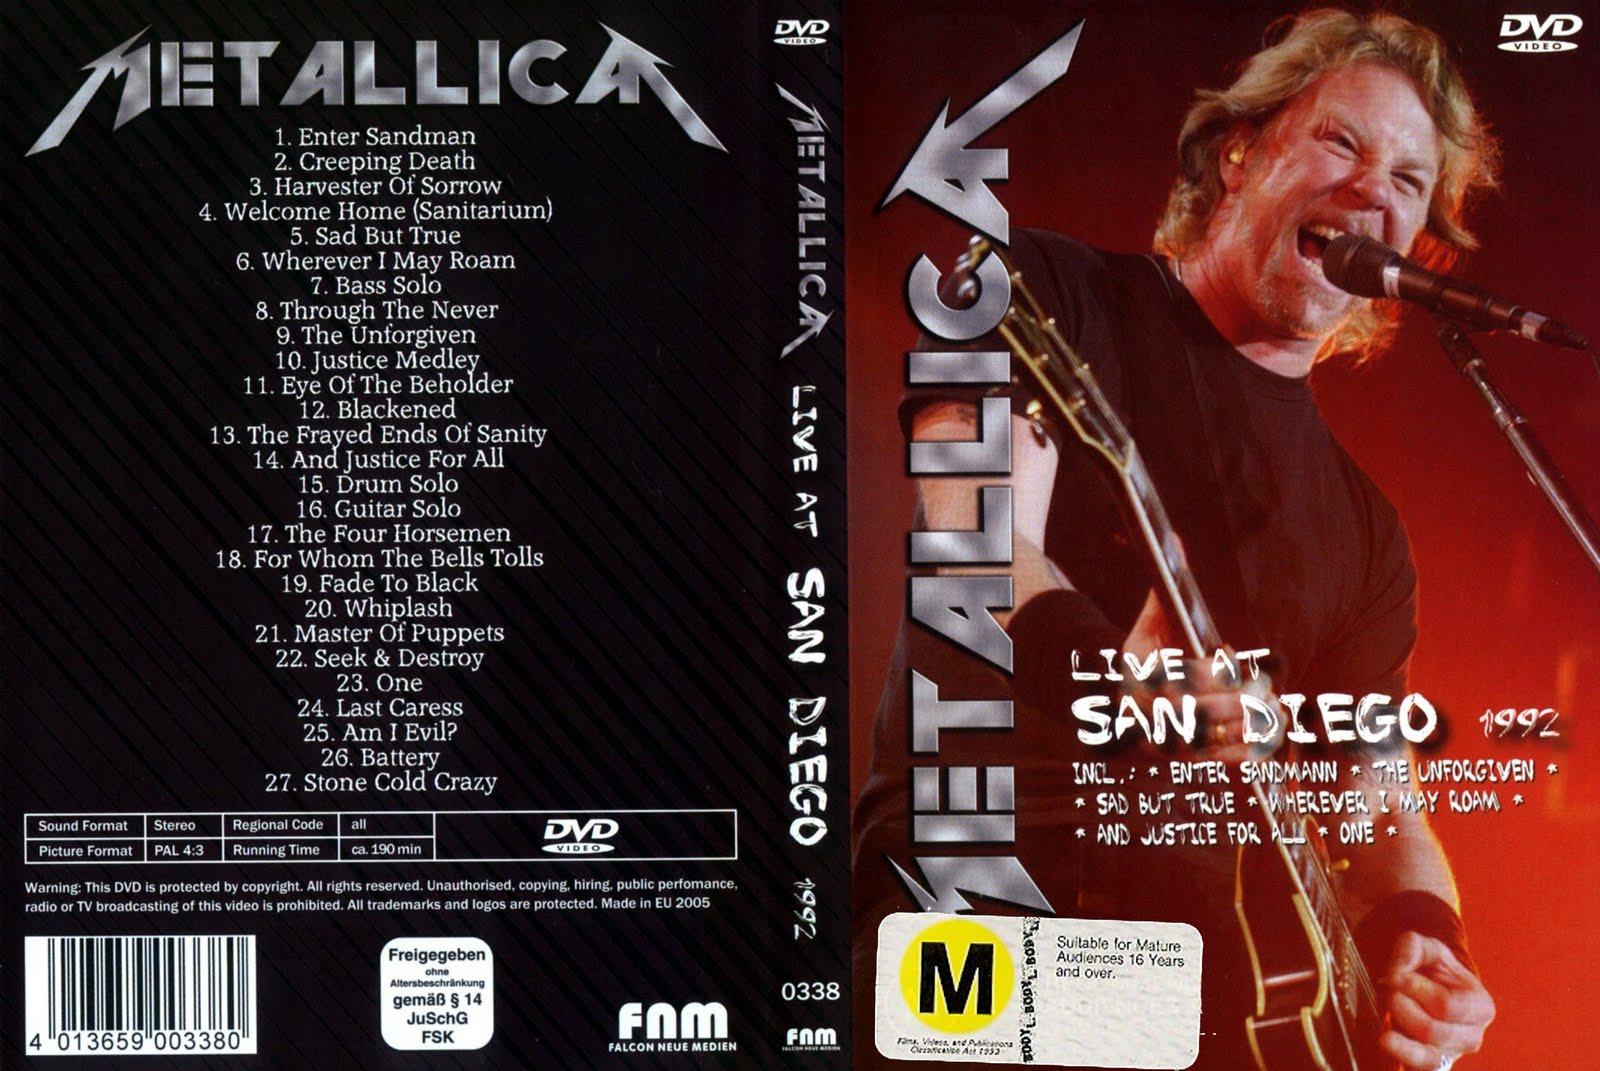 BOOTSLIVE: Metallica - Live at San Diego 1992 (DVD-Rip)